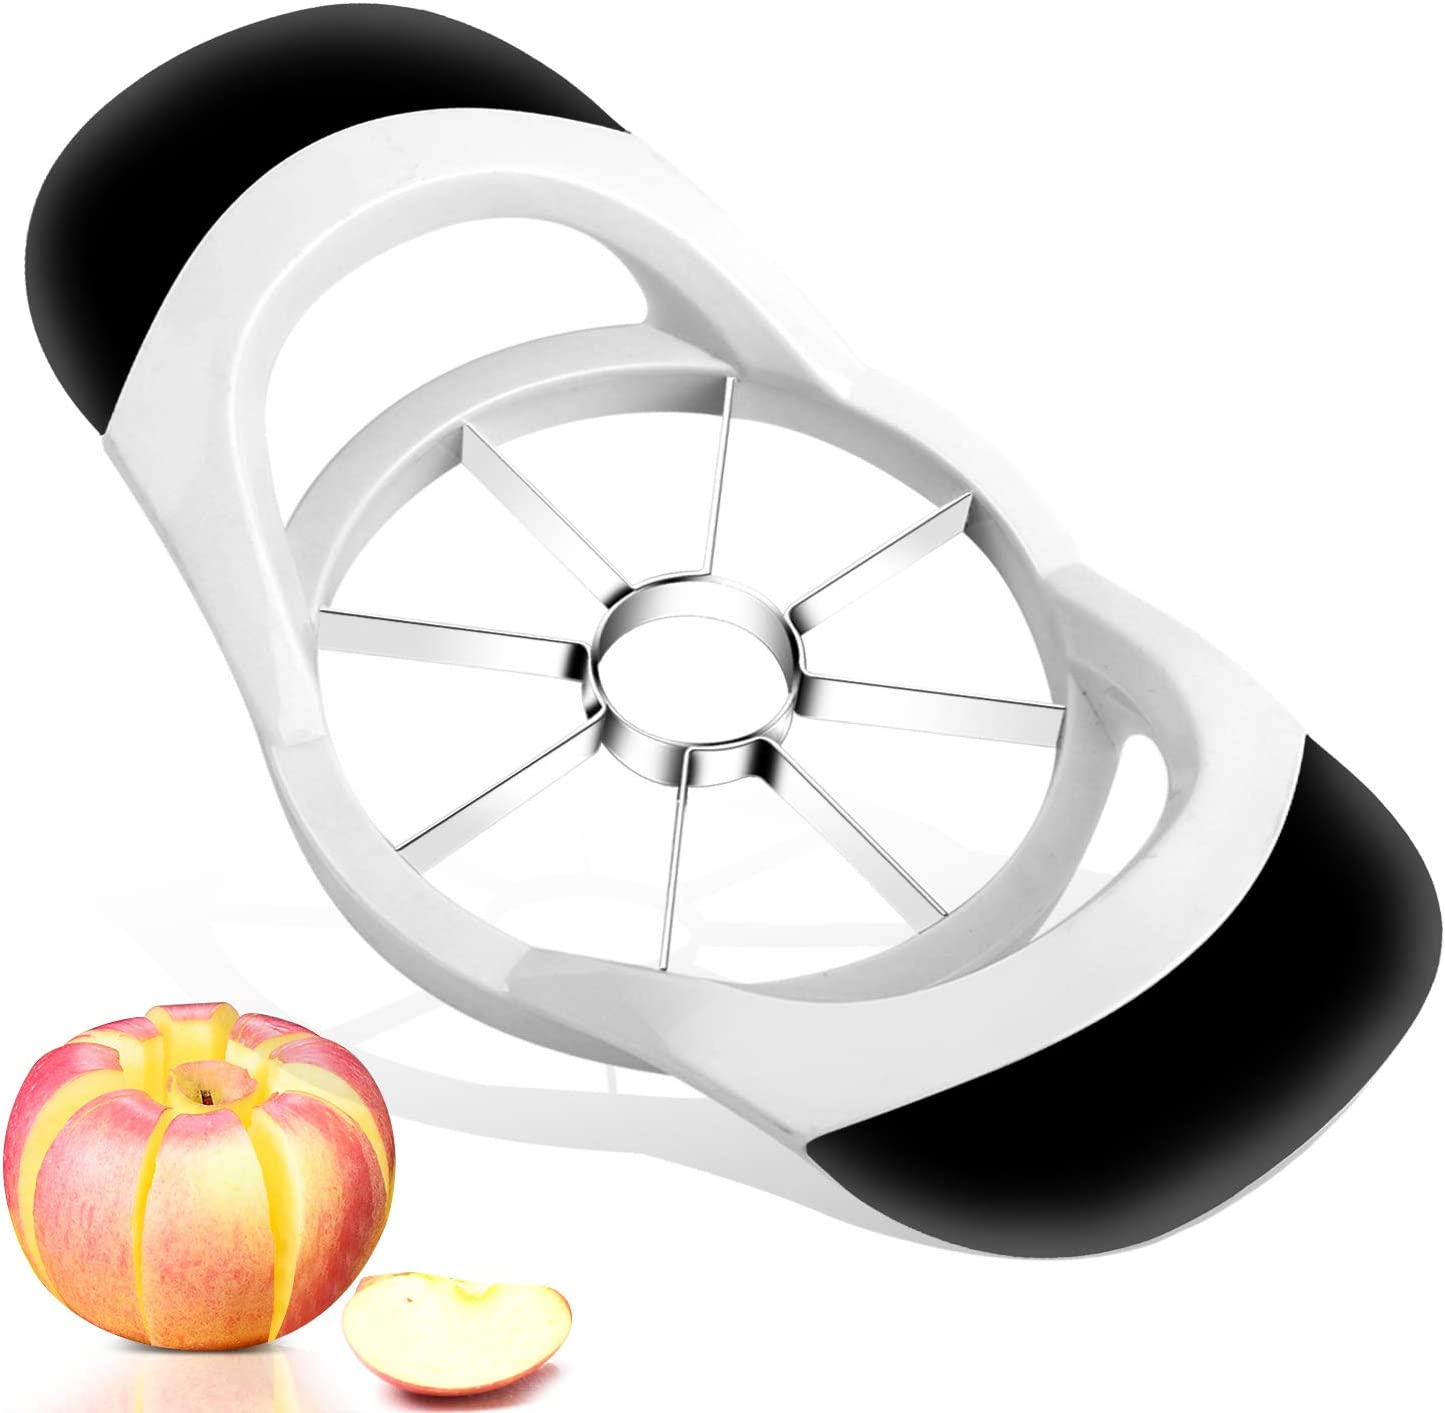 Apple Slicer, McoMce Apple Corer Tool,7.1 x 4.2 x 1.5 Inches Apple Cutter Slicer Corer, Sharp Apple Cutter,430 Stainless Steel Apple Slicer and Corer, Great Apple Corer Remover,8 Slices Apple Corer